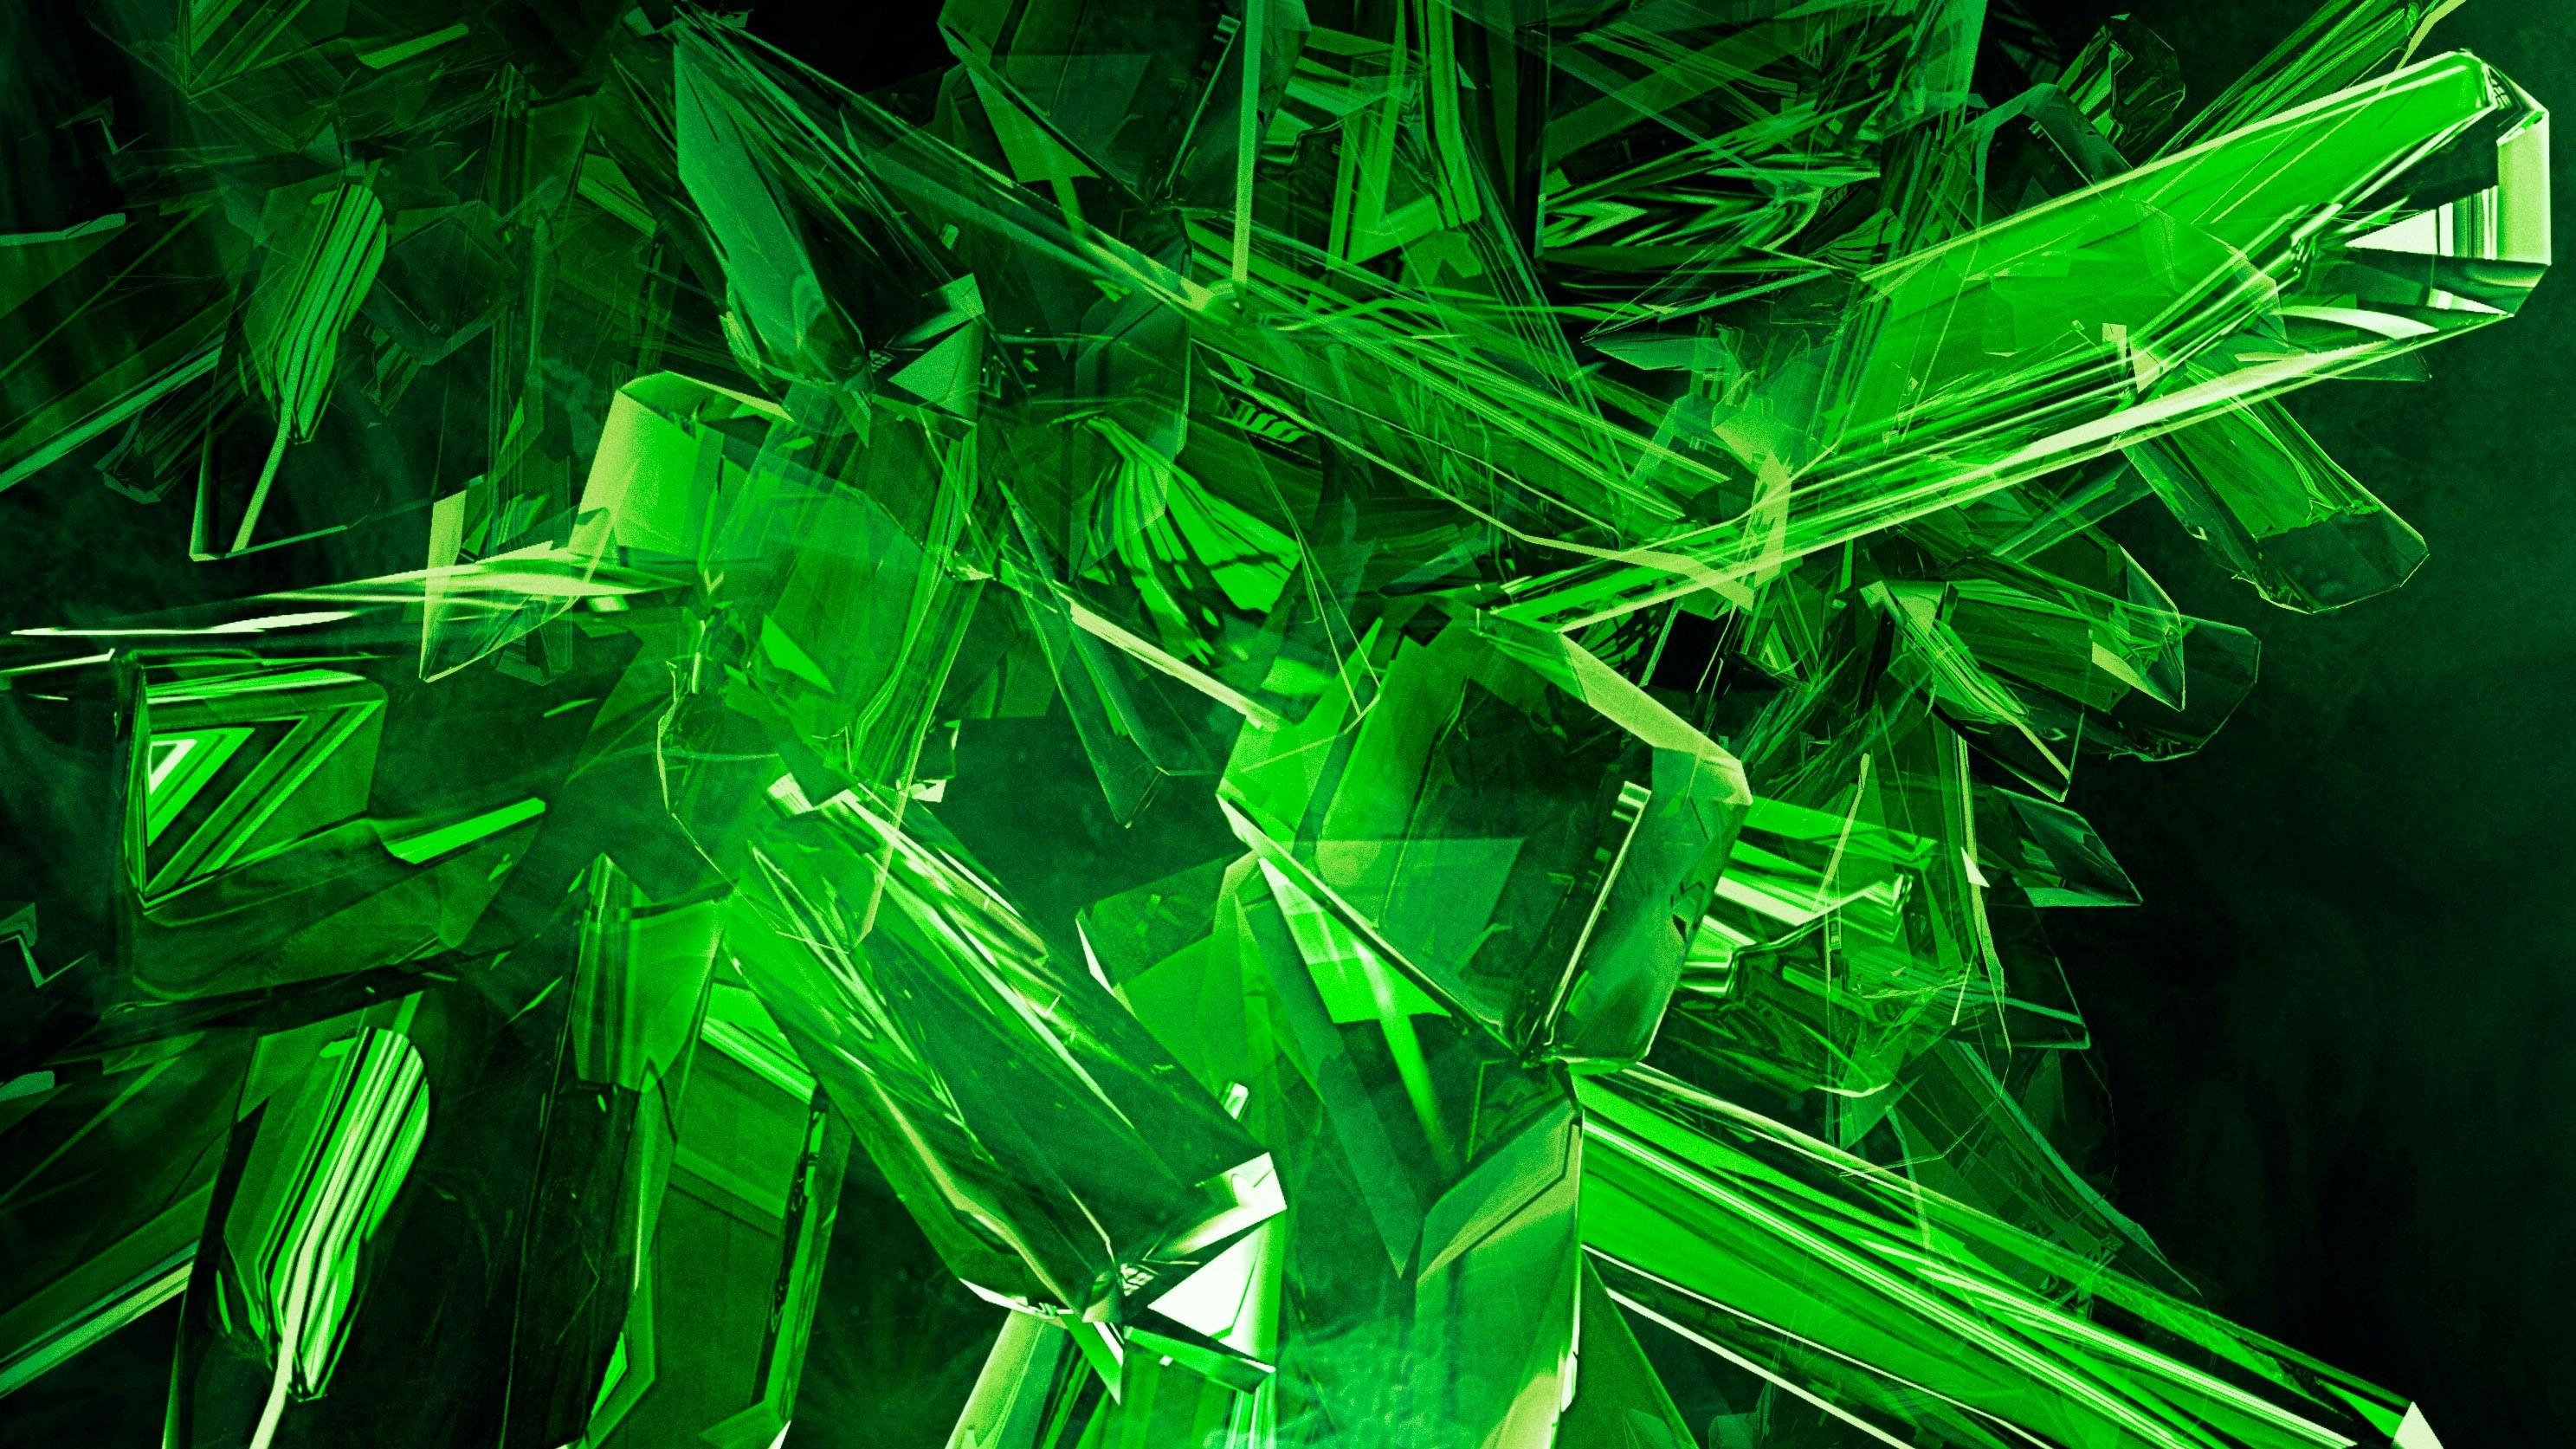 cool desktop hd wallpaper 14591 Image Green View Abstract Gems Cool HD .